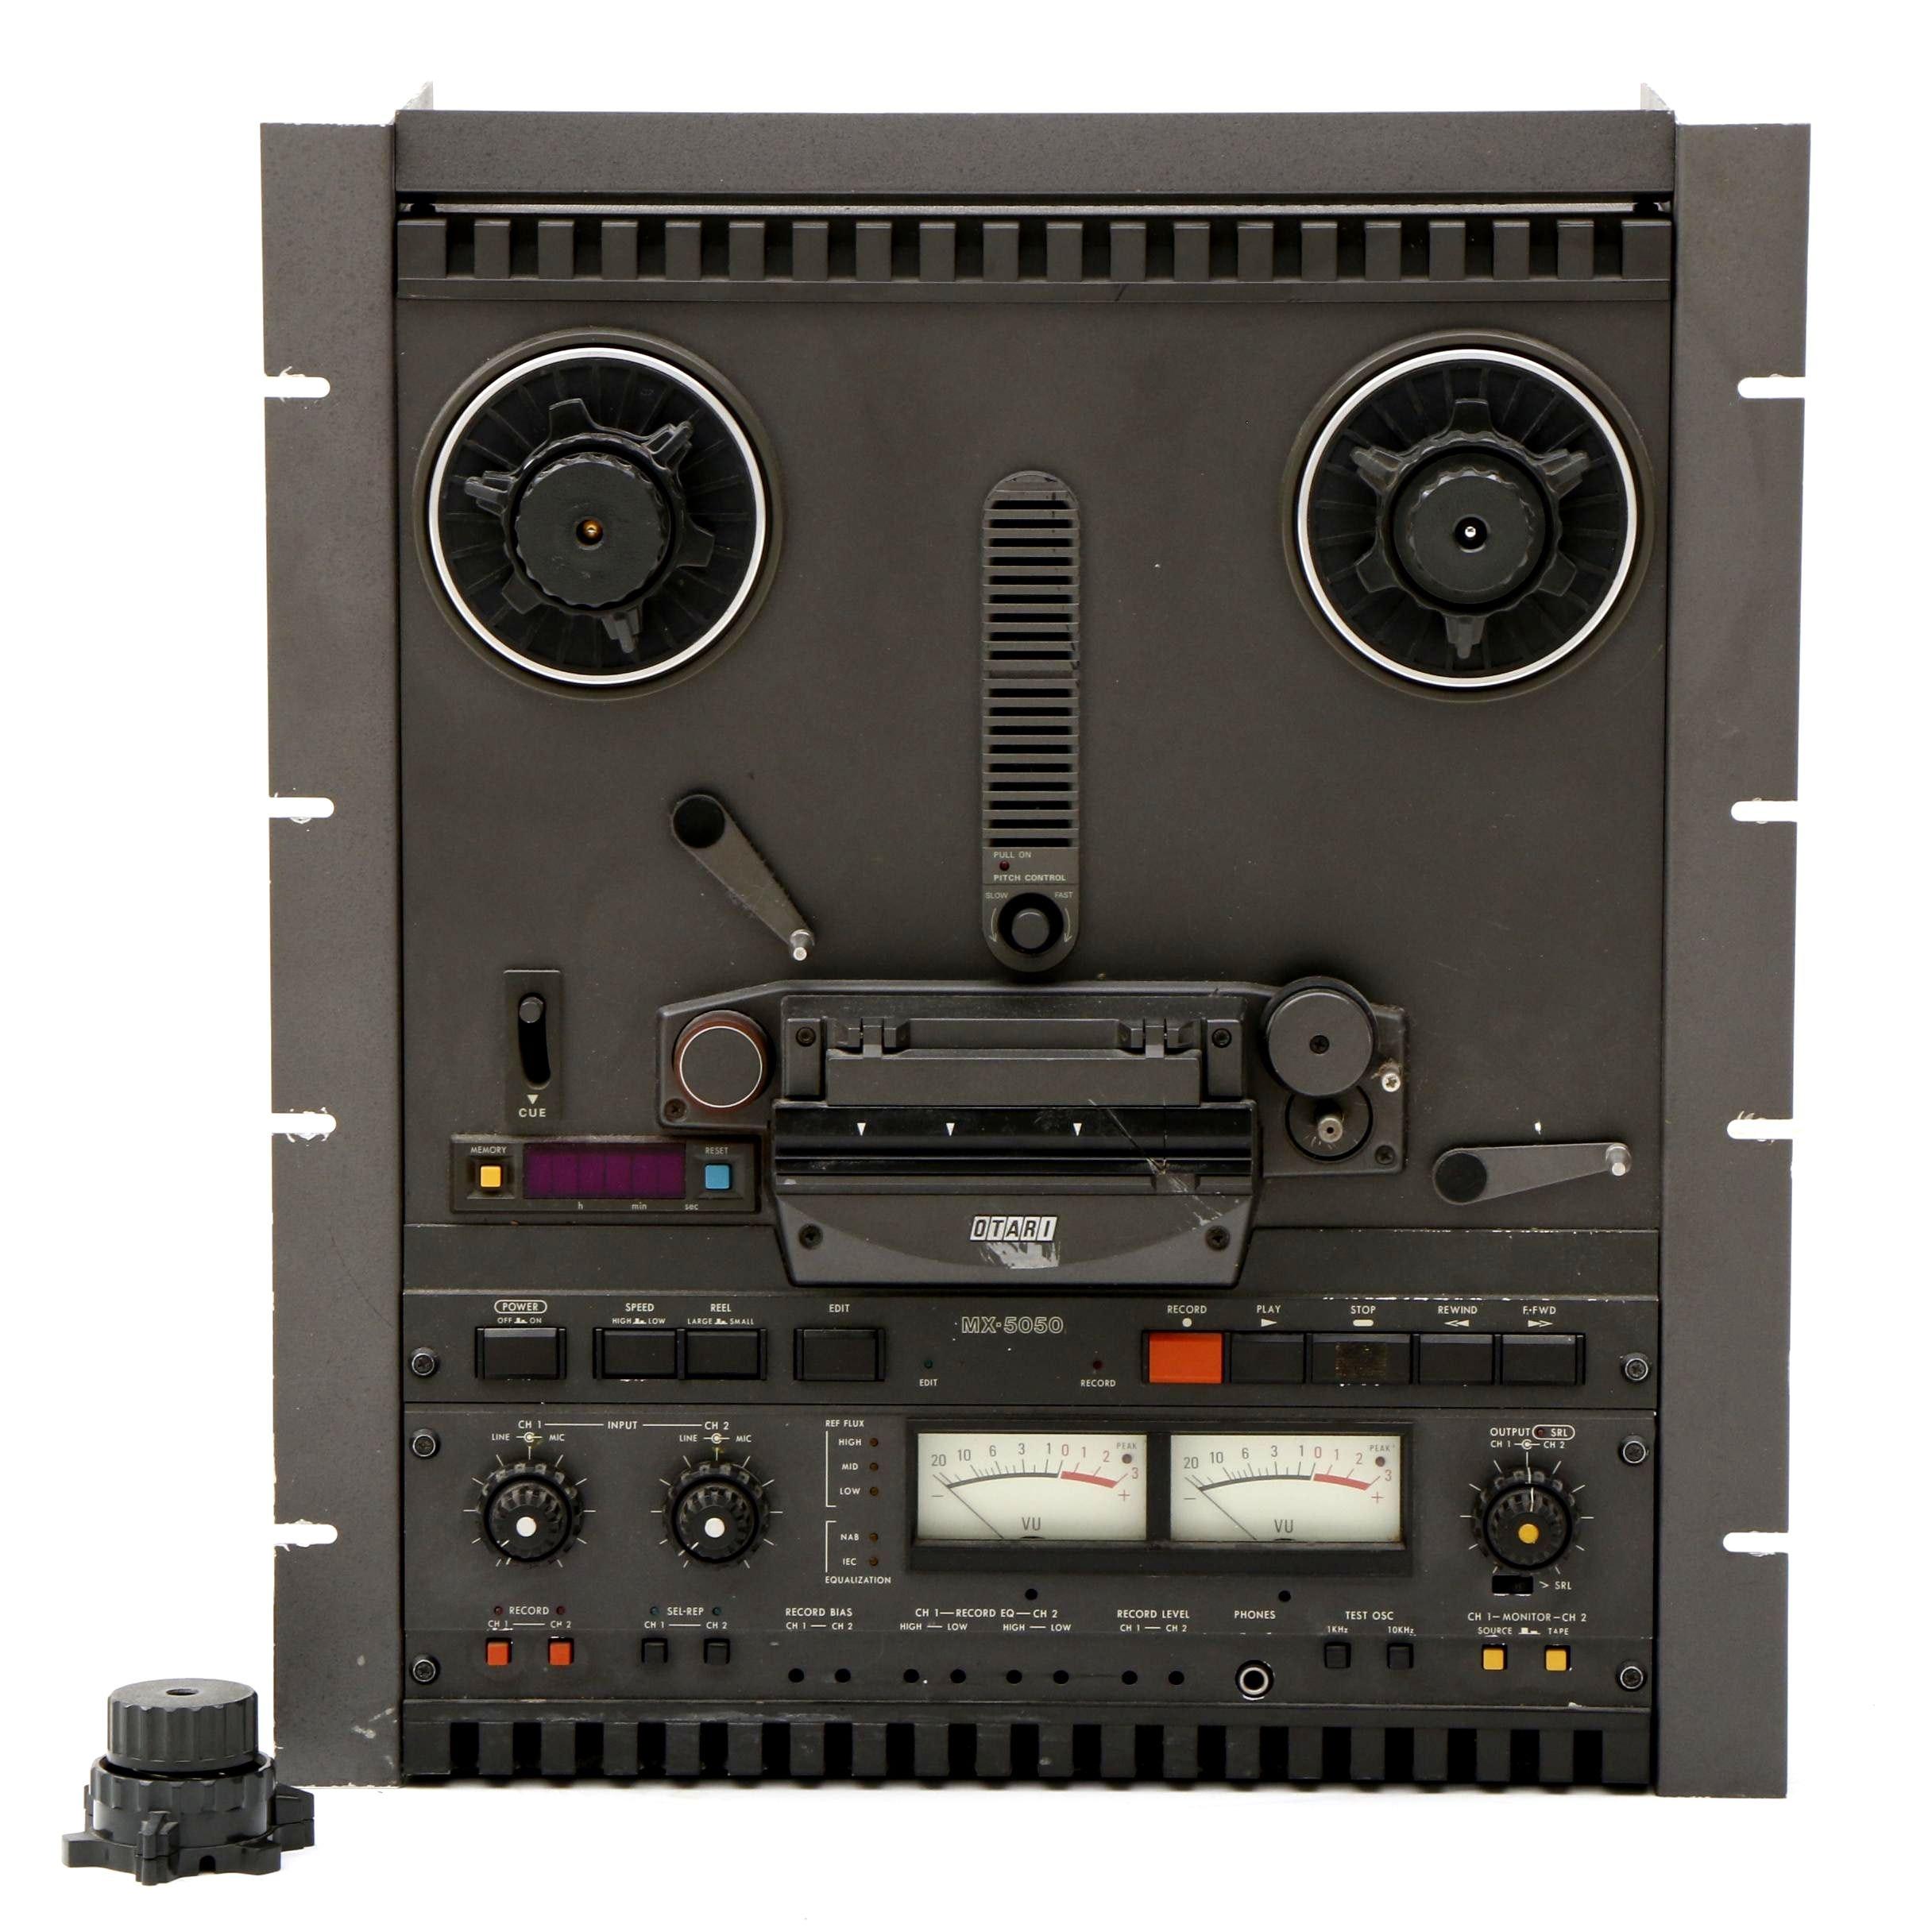 Otari MX-5050 BII-2 Tape Recorder